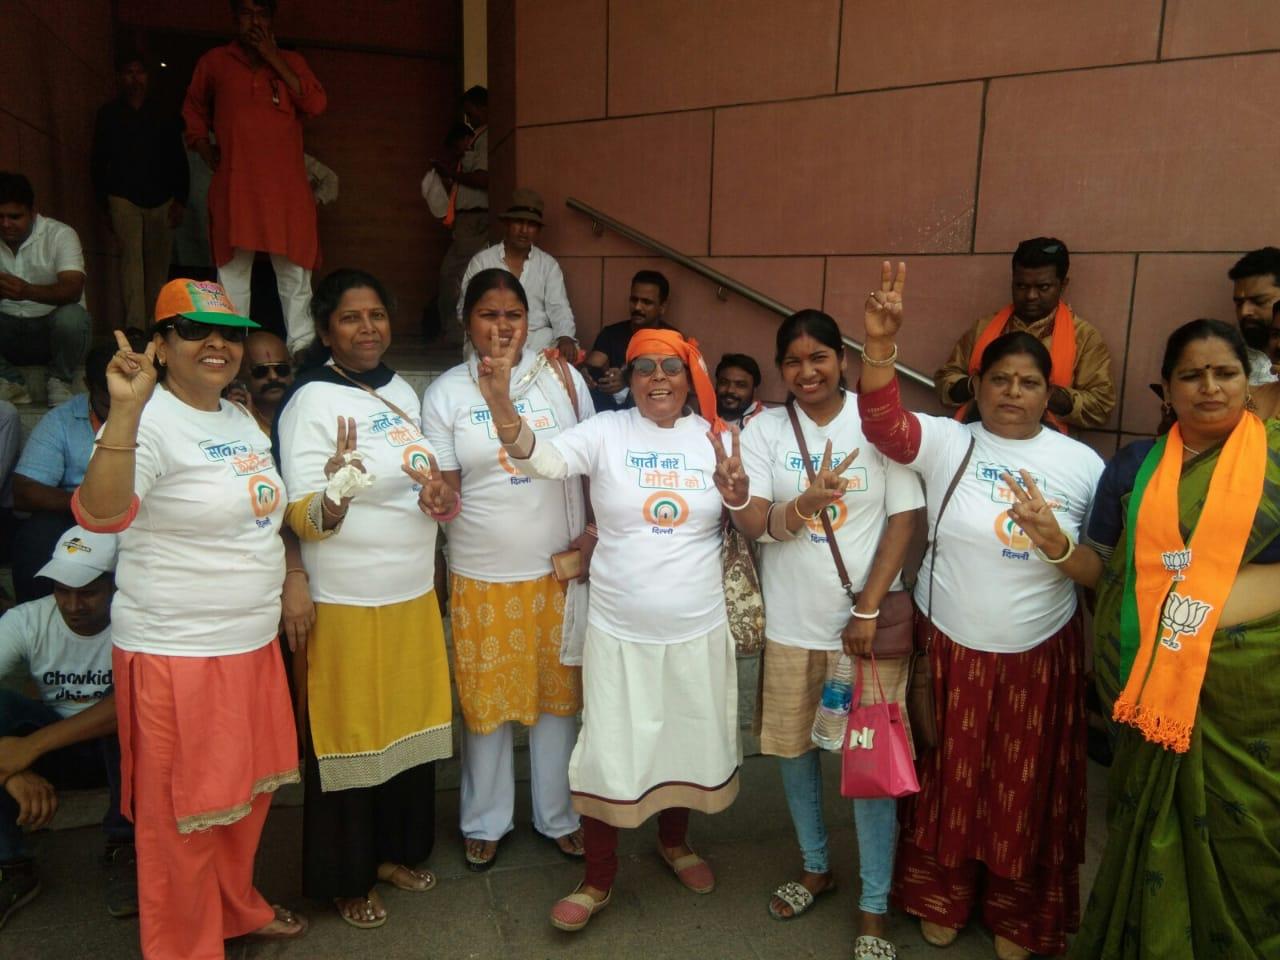 भाजपा मुख्यालय पर जश्न मनाते कार्यकर्ता